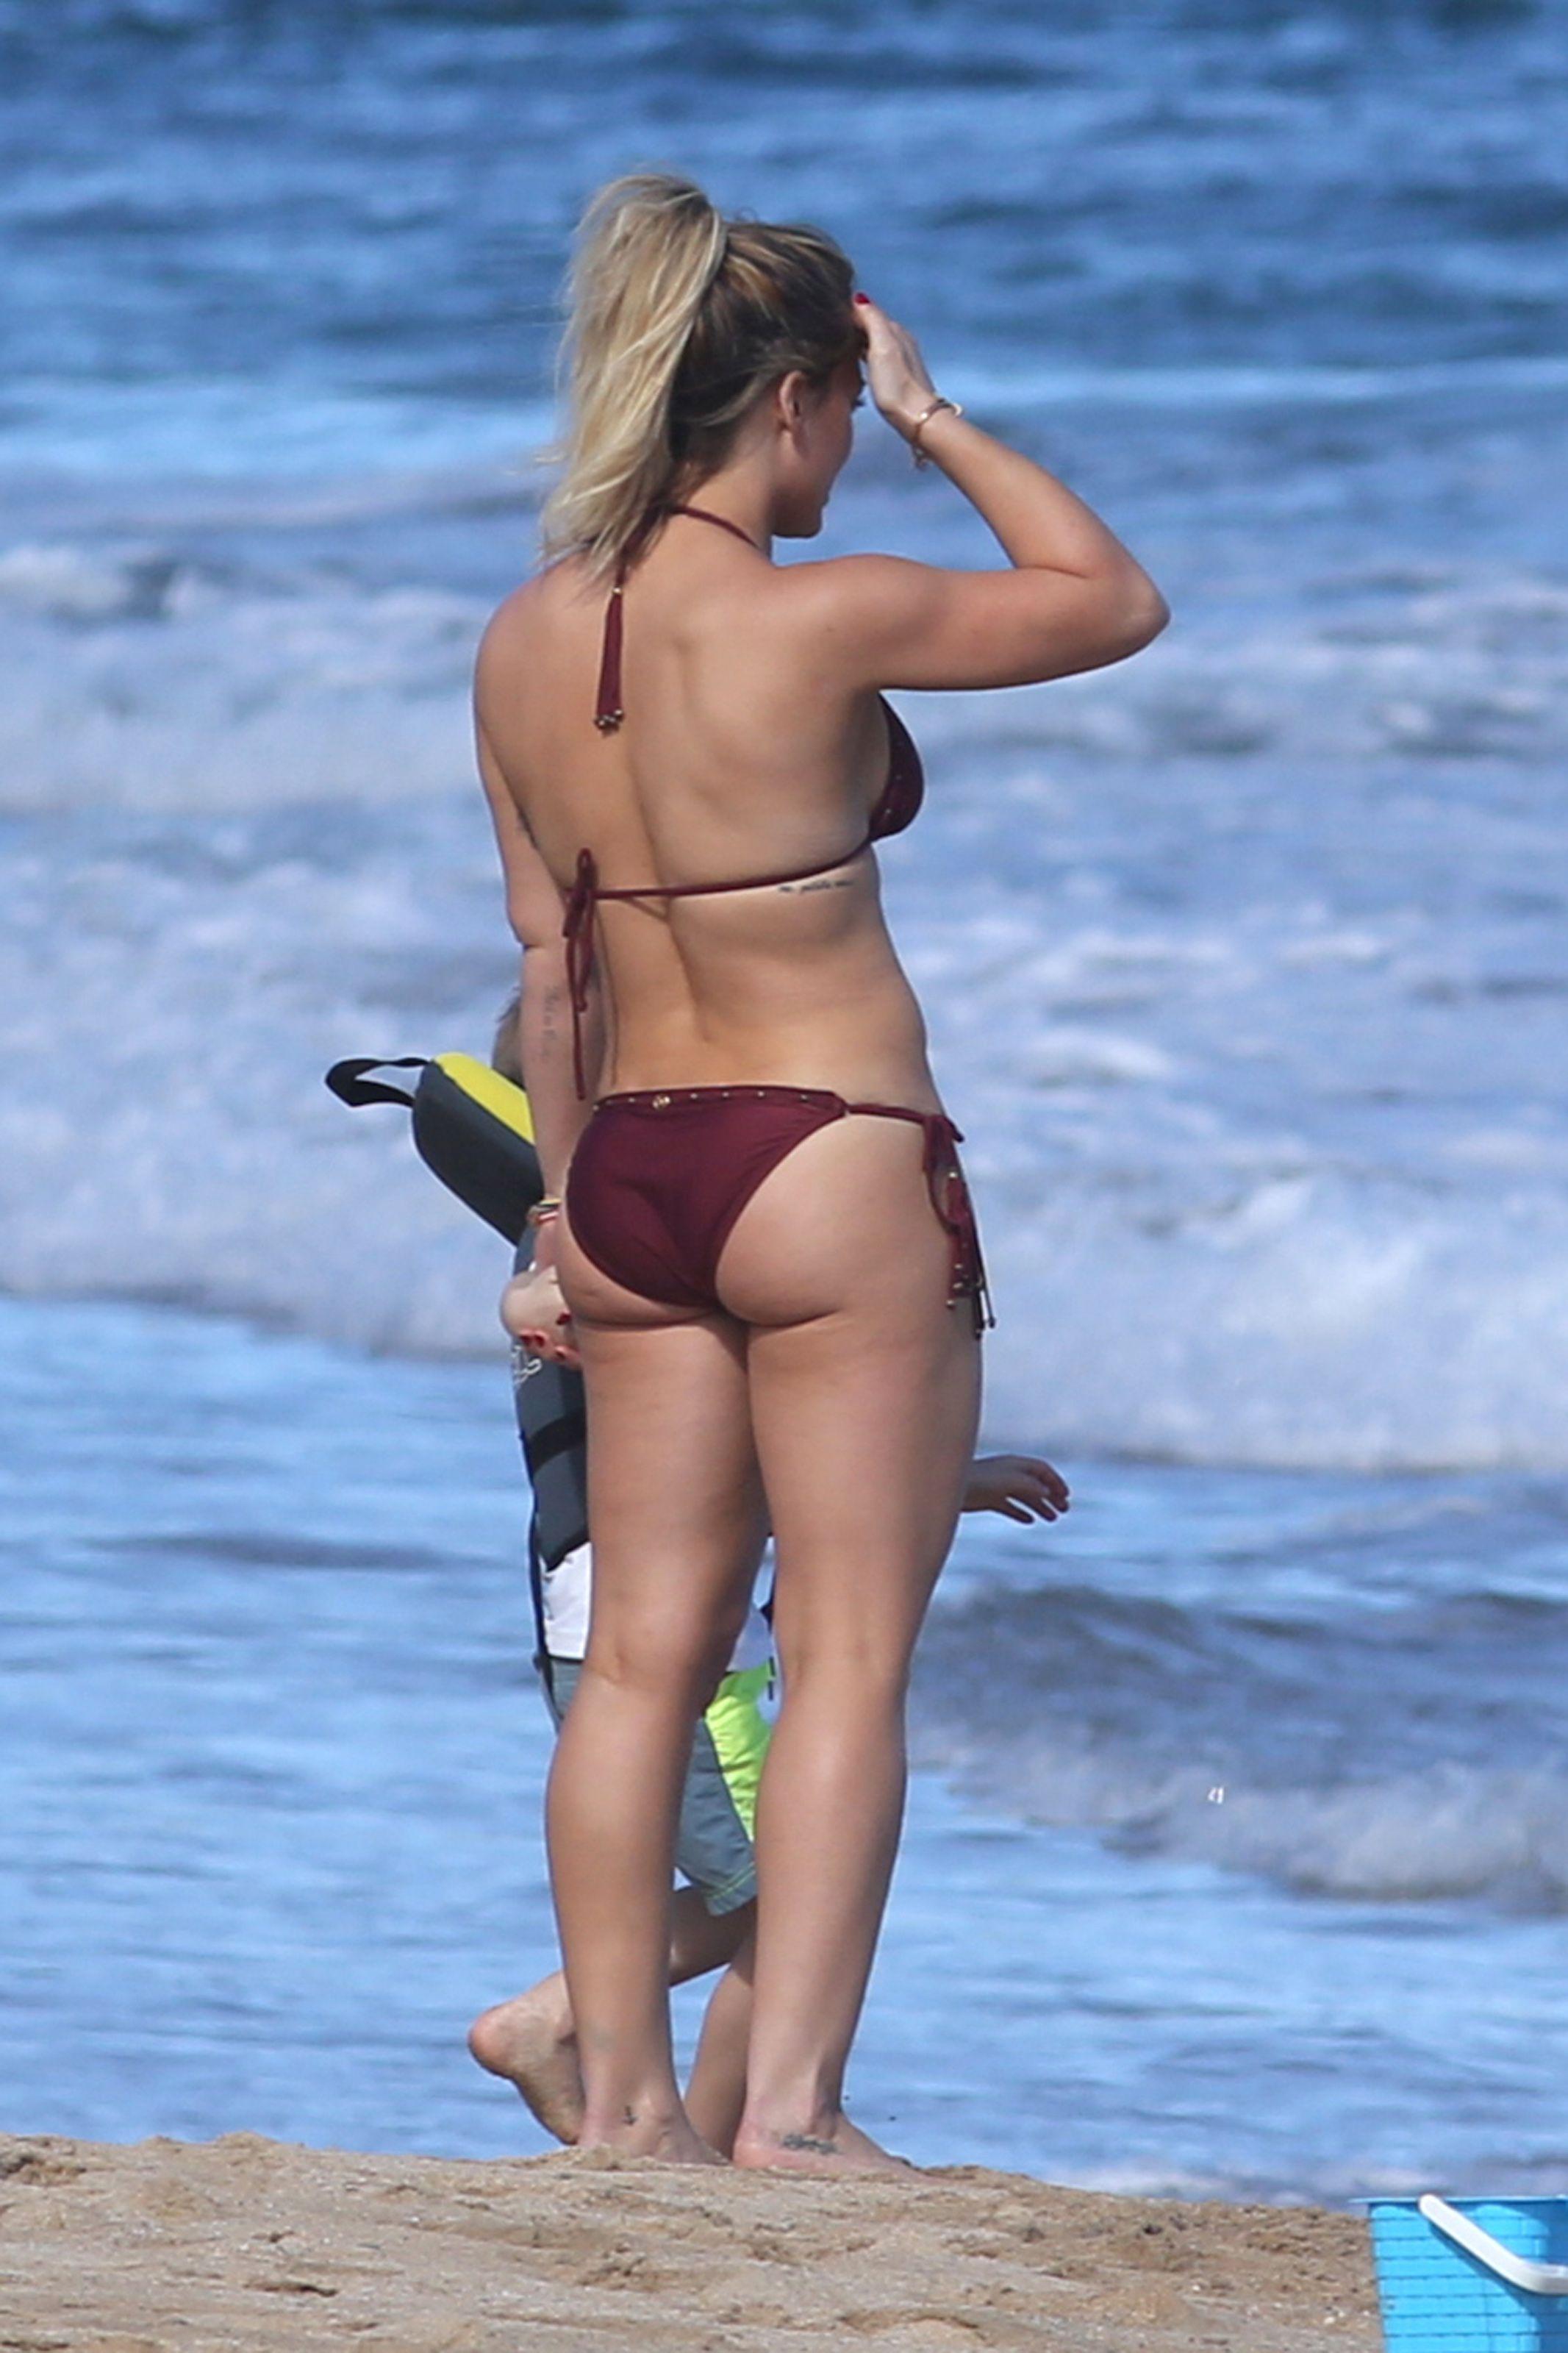 Beach milf pic post